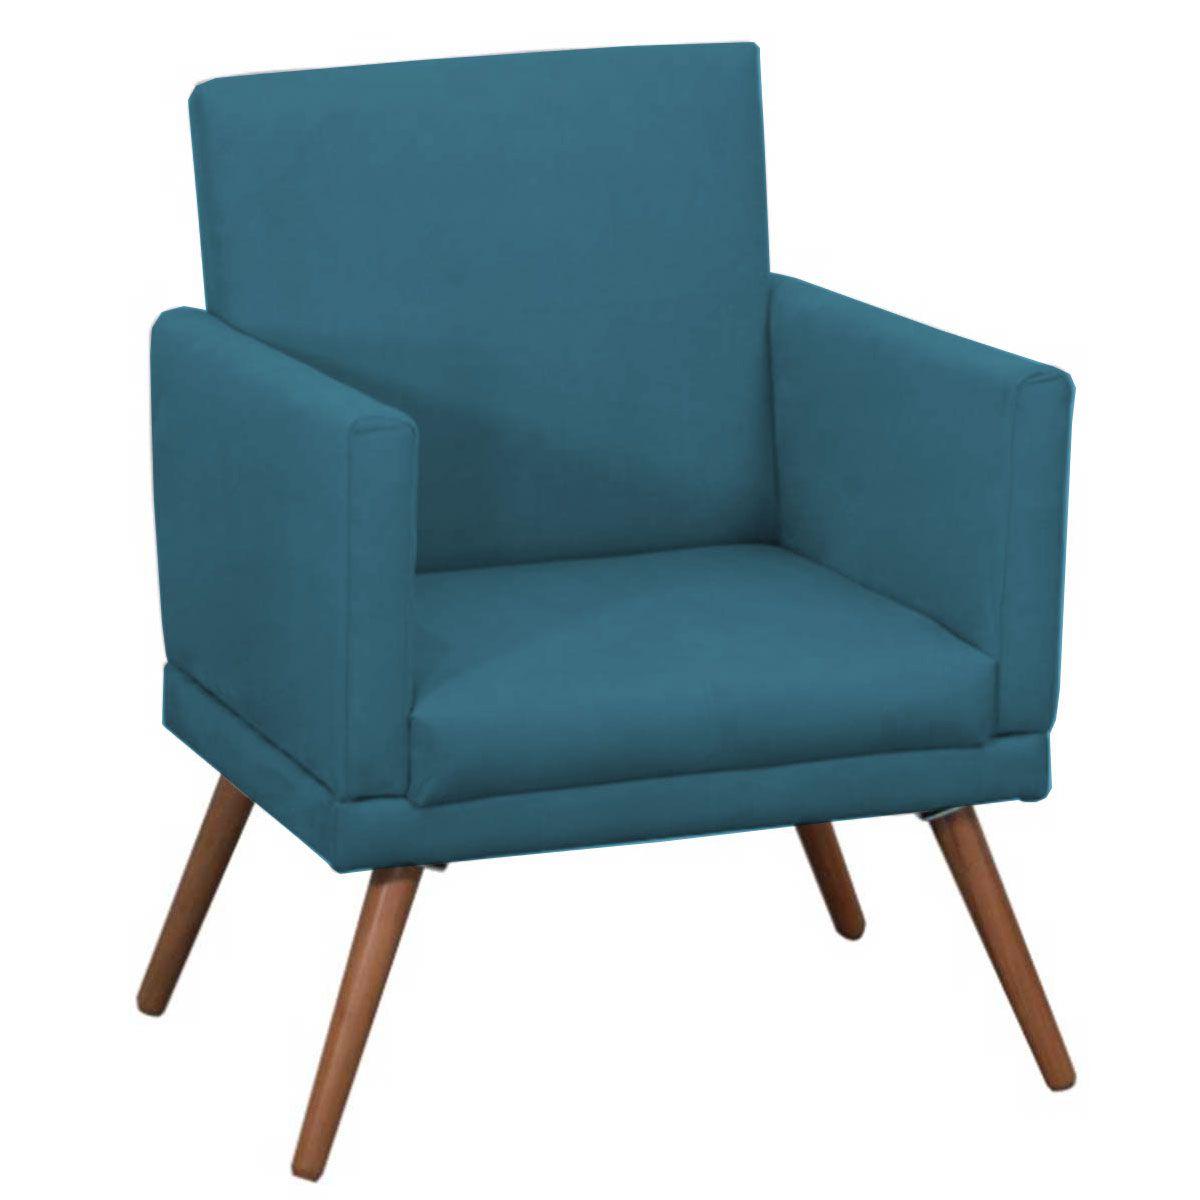 Poltrona Decorativa New Nina Luxo Pé Palito Azul Turquesa